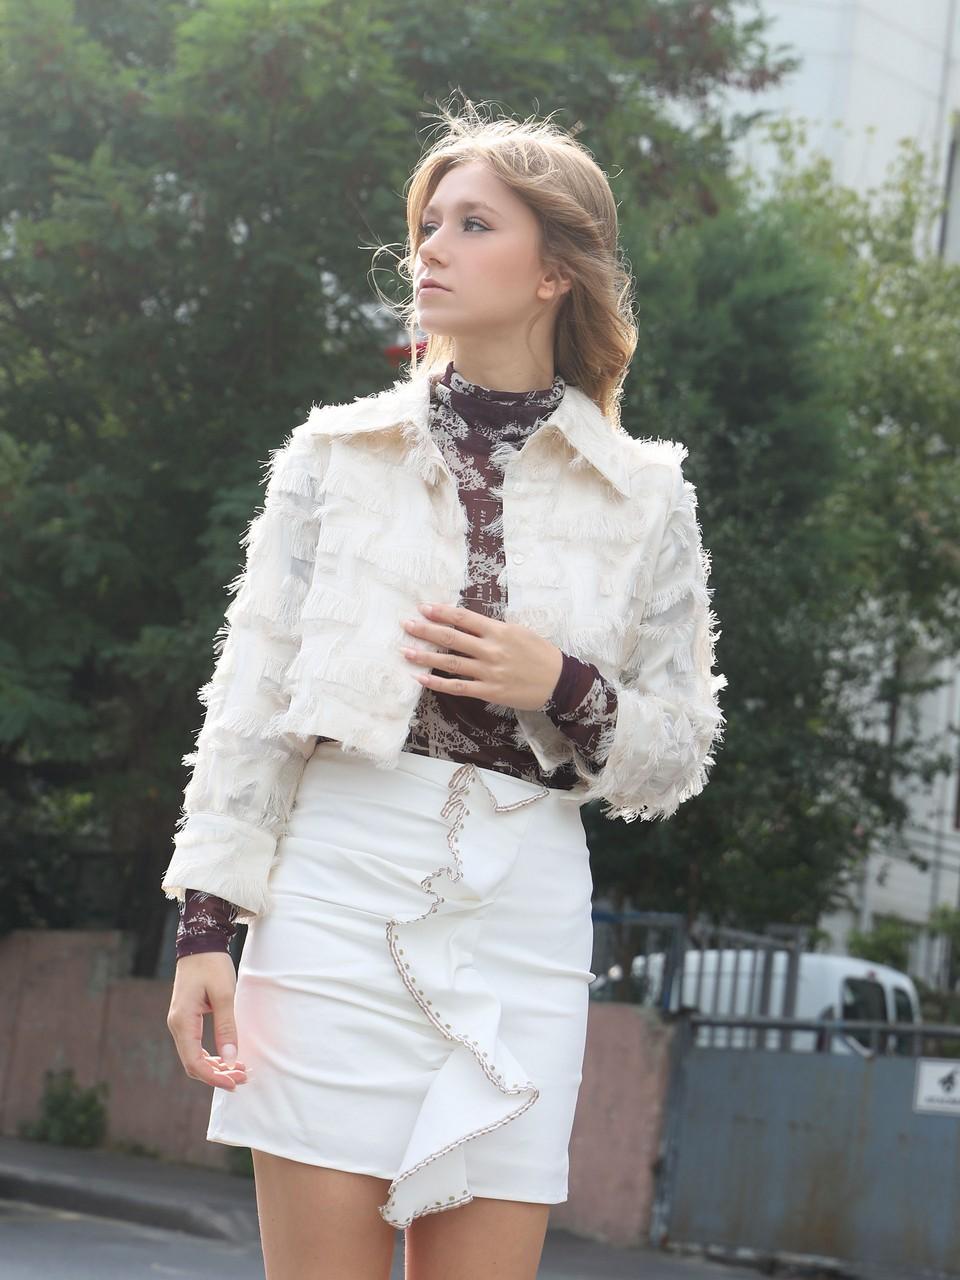 Asymmetric Cut Skirt